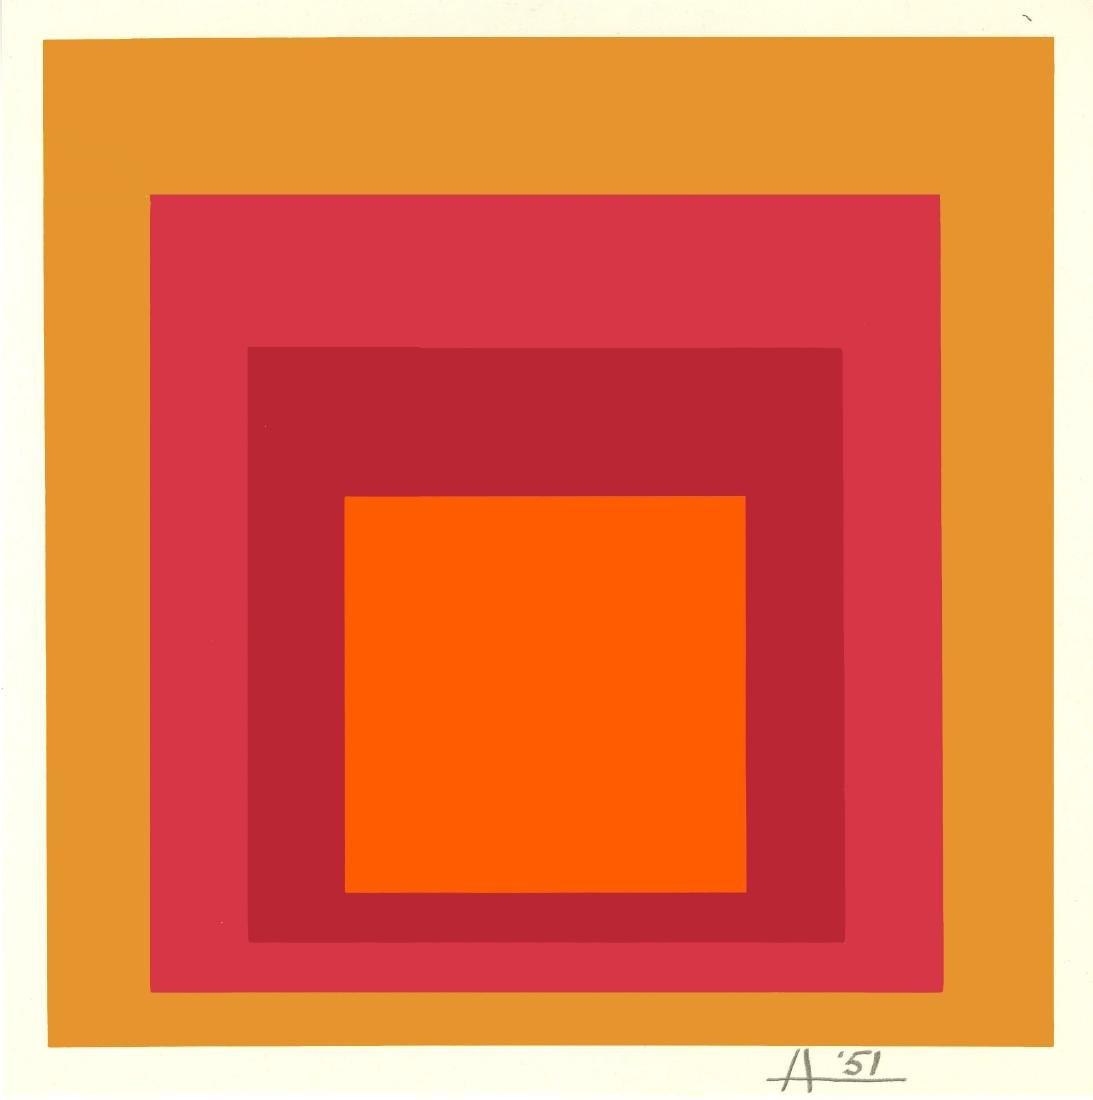 865: JOSEF ALBERS - Homage to the Square: La Tehuana